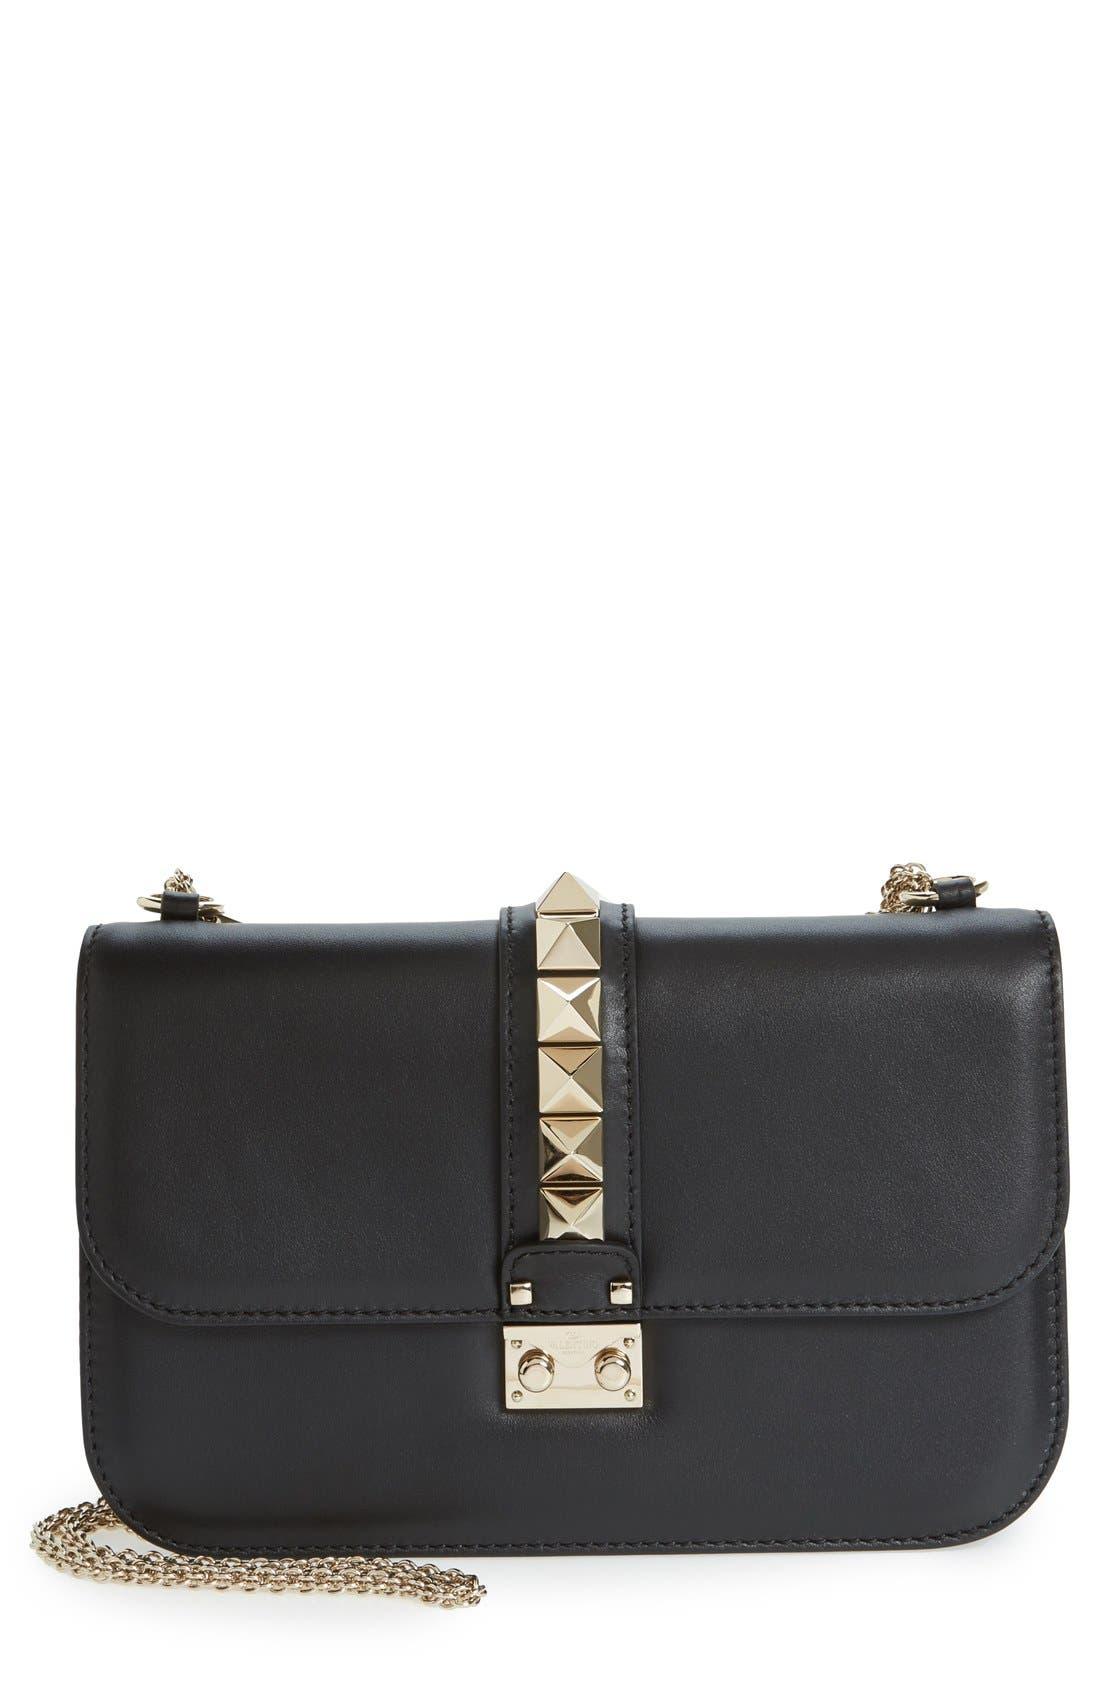 Main Image - Valentino 'Medium Lock' Studded Leather Shoulder Bag